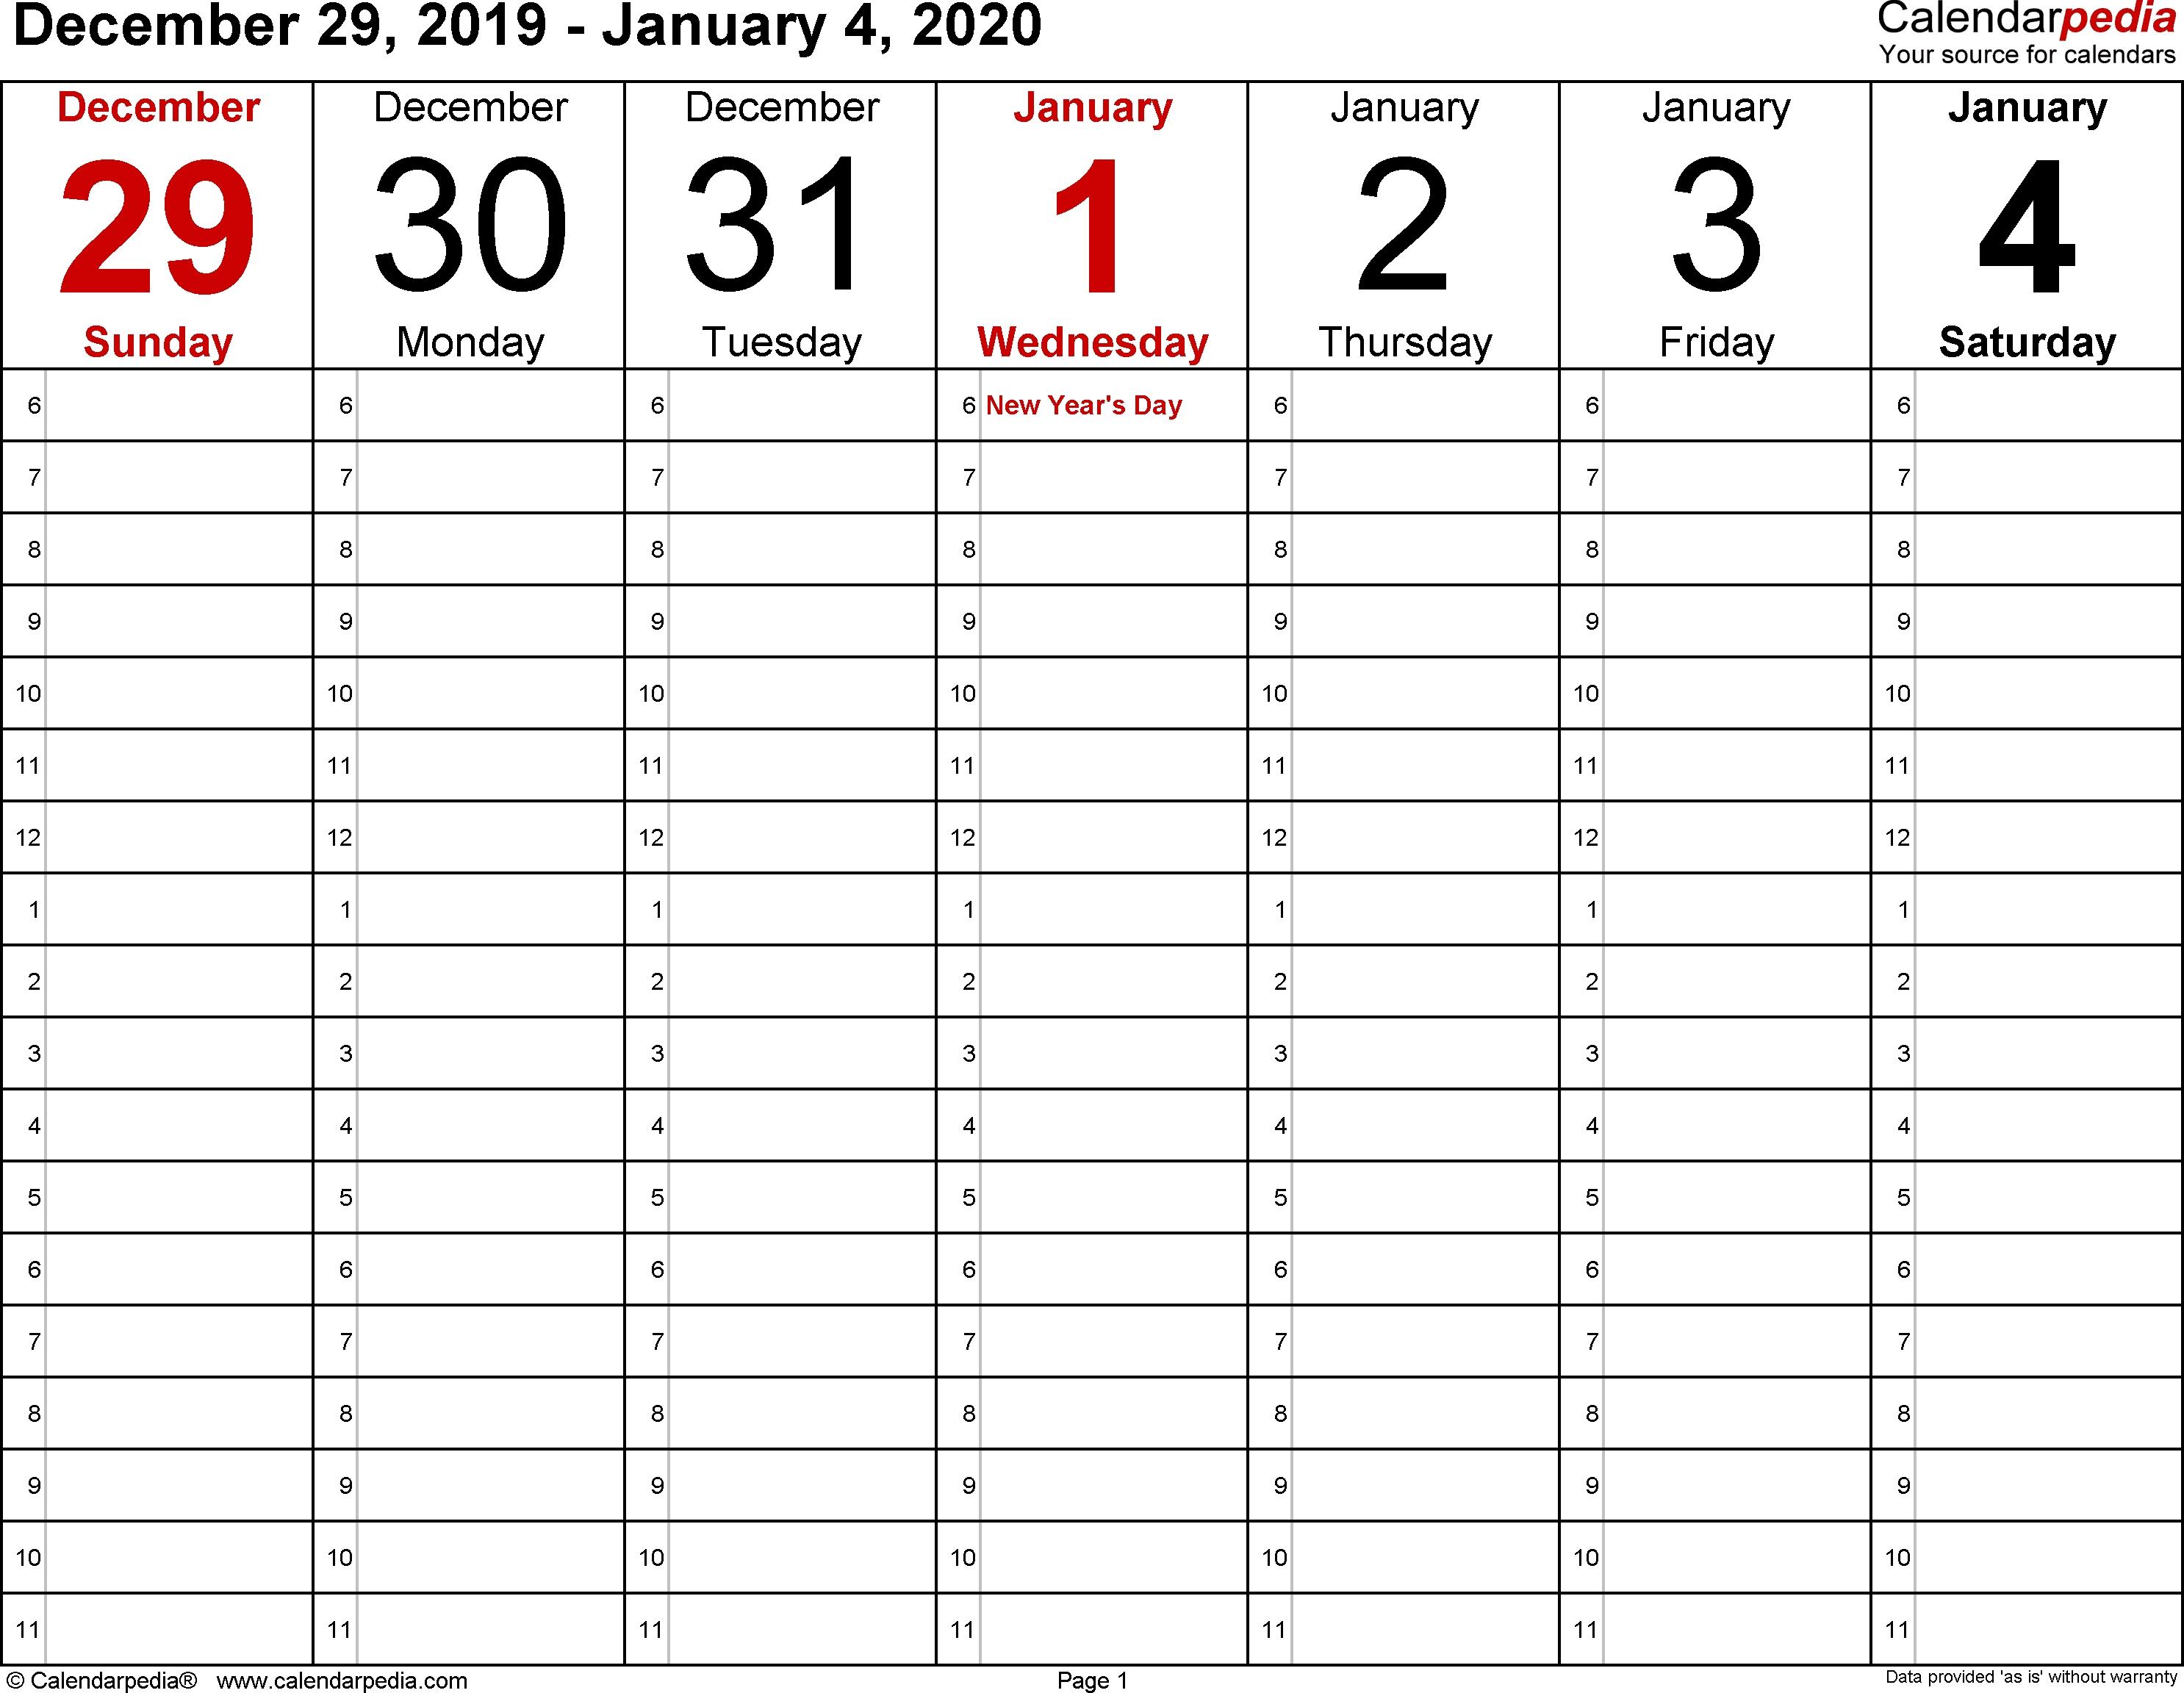 Weekly Calendar 2020 For Word - 12 Free Printable Templates-Printable 2020 Blank Calendar On 8 X 11 Size